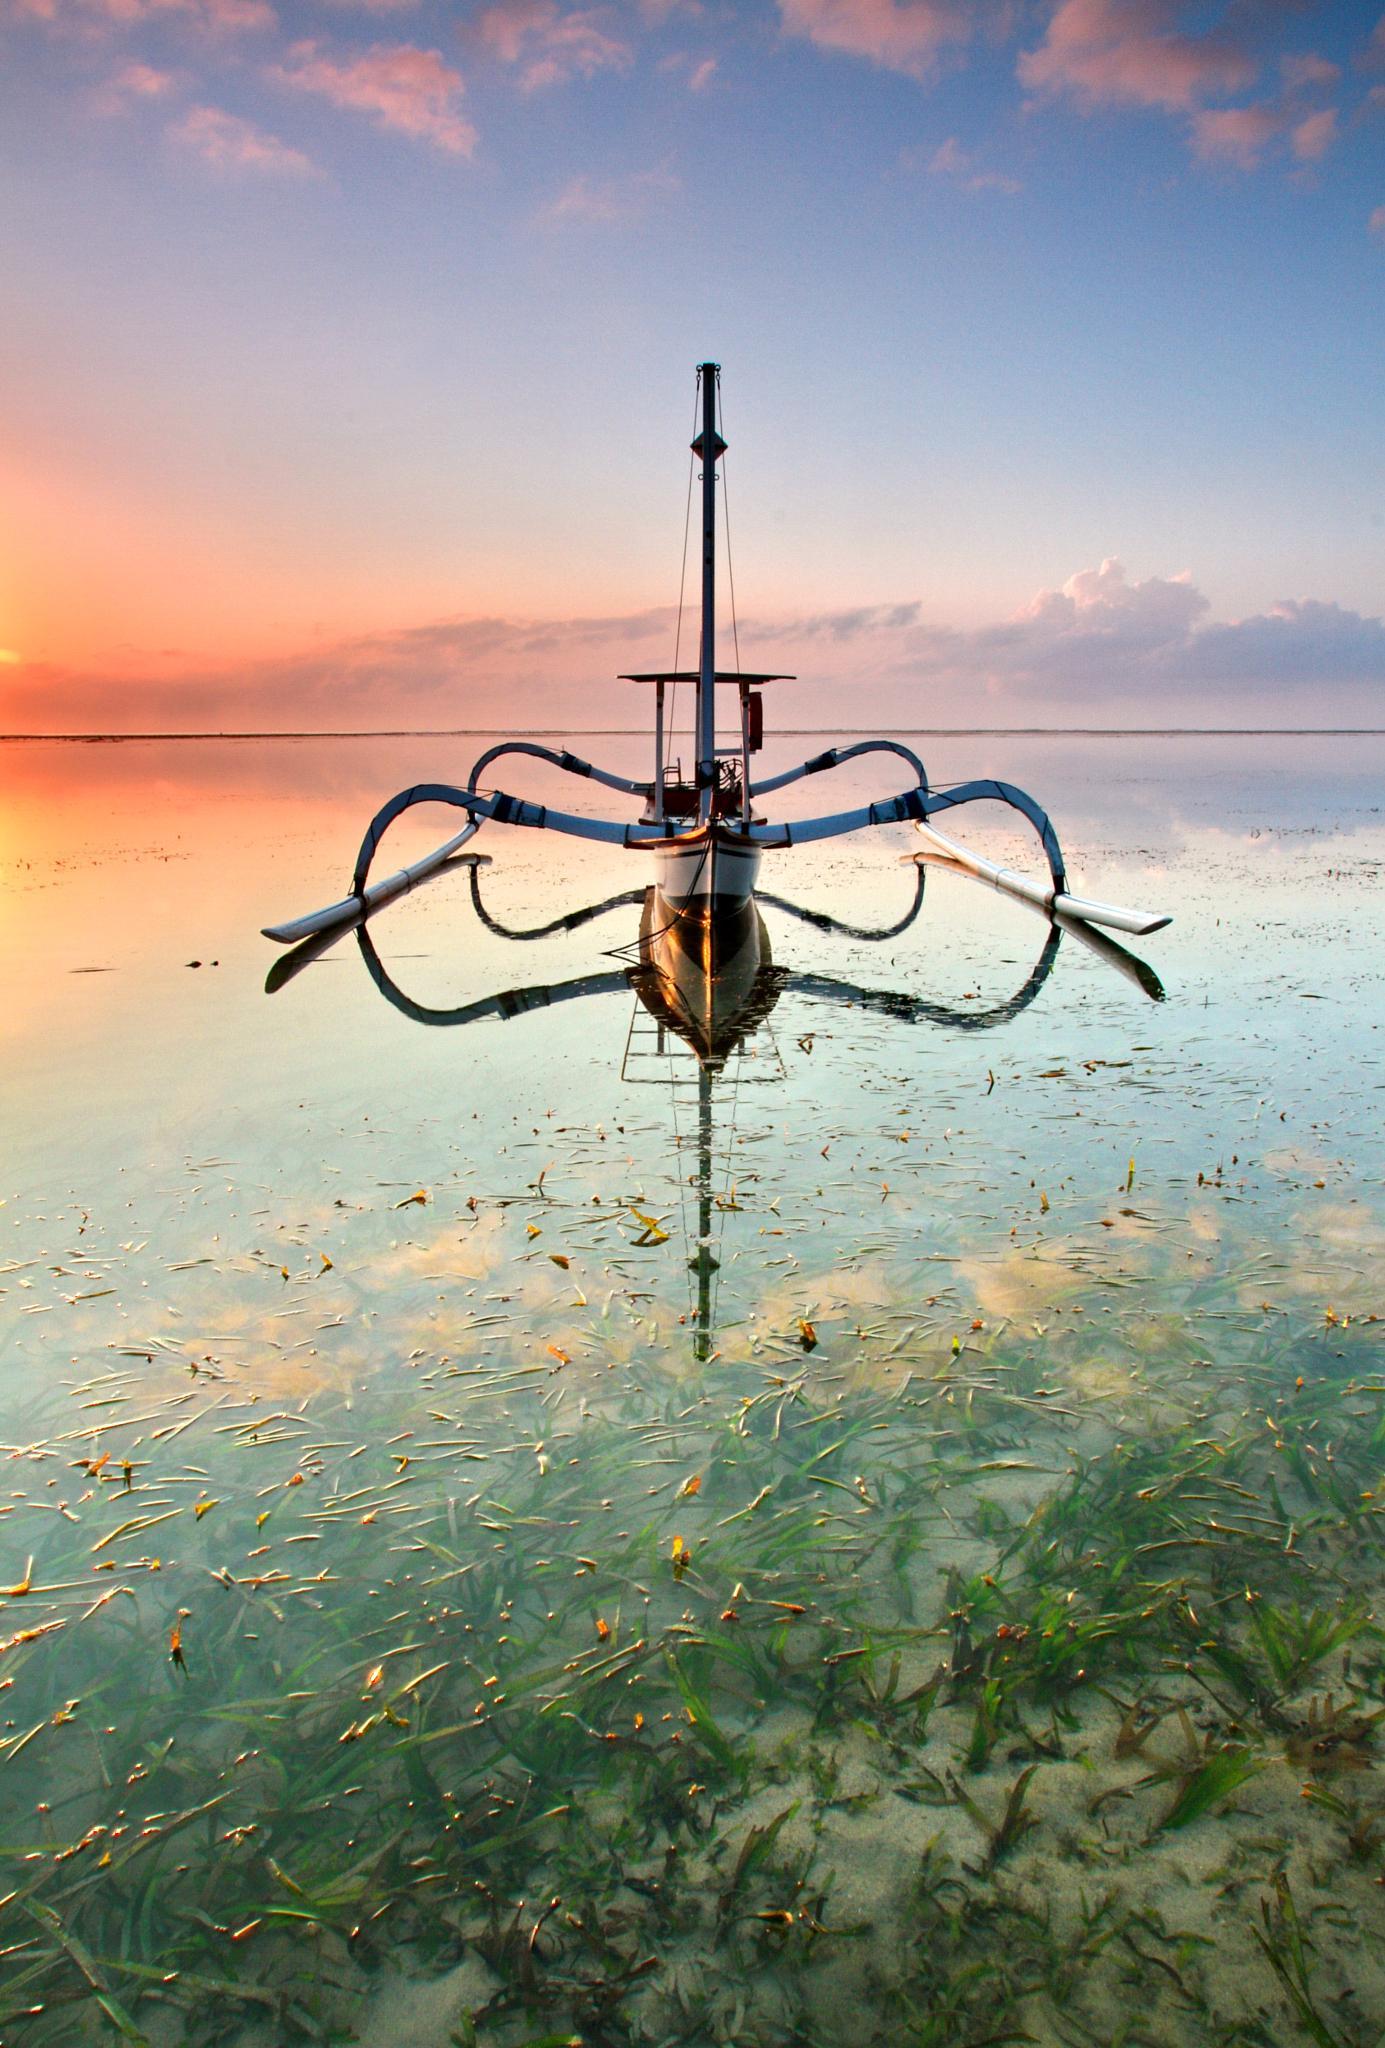 The Boat by Hendra Gunawan